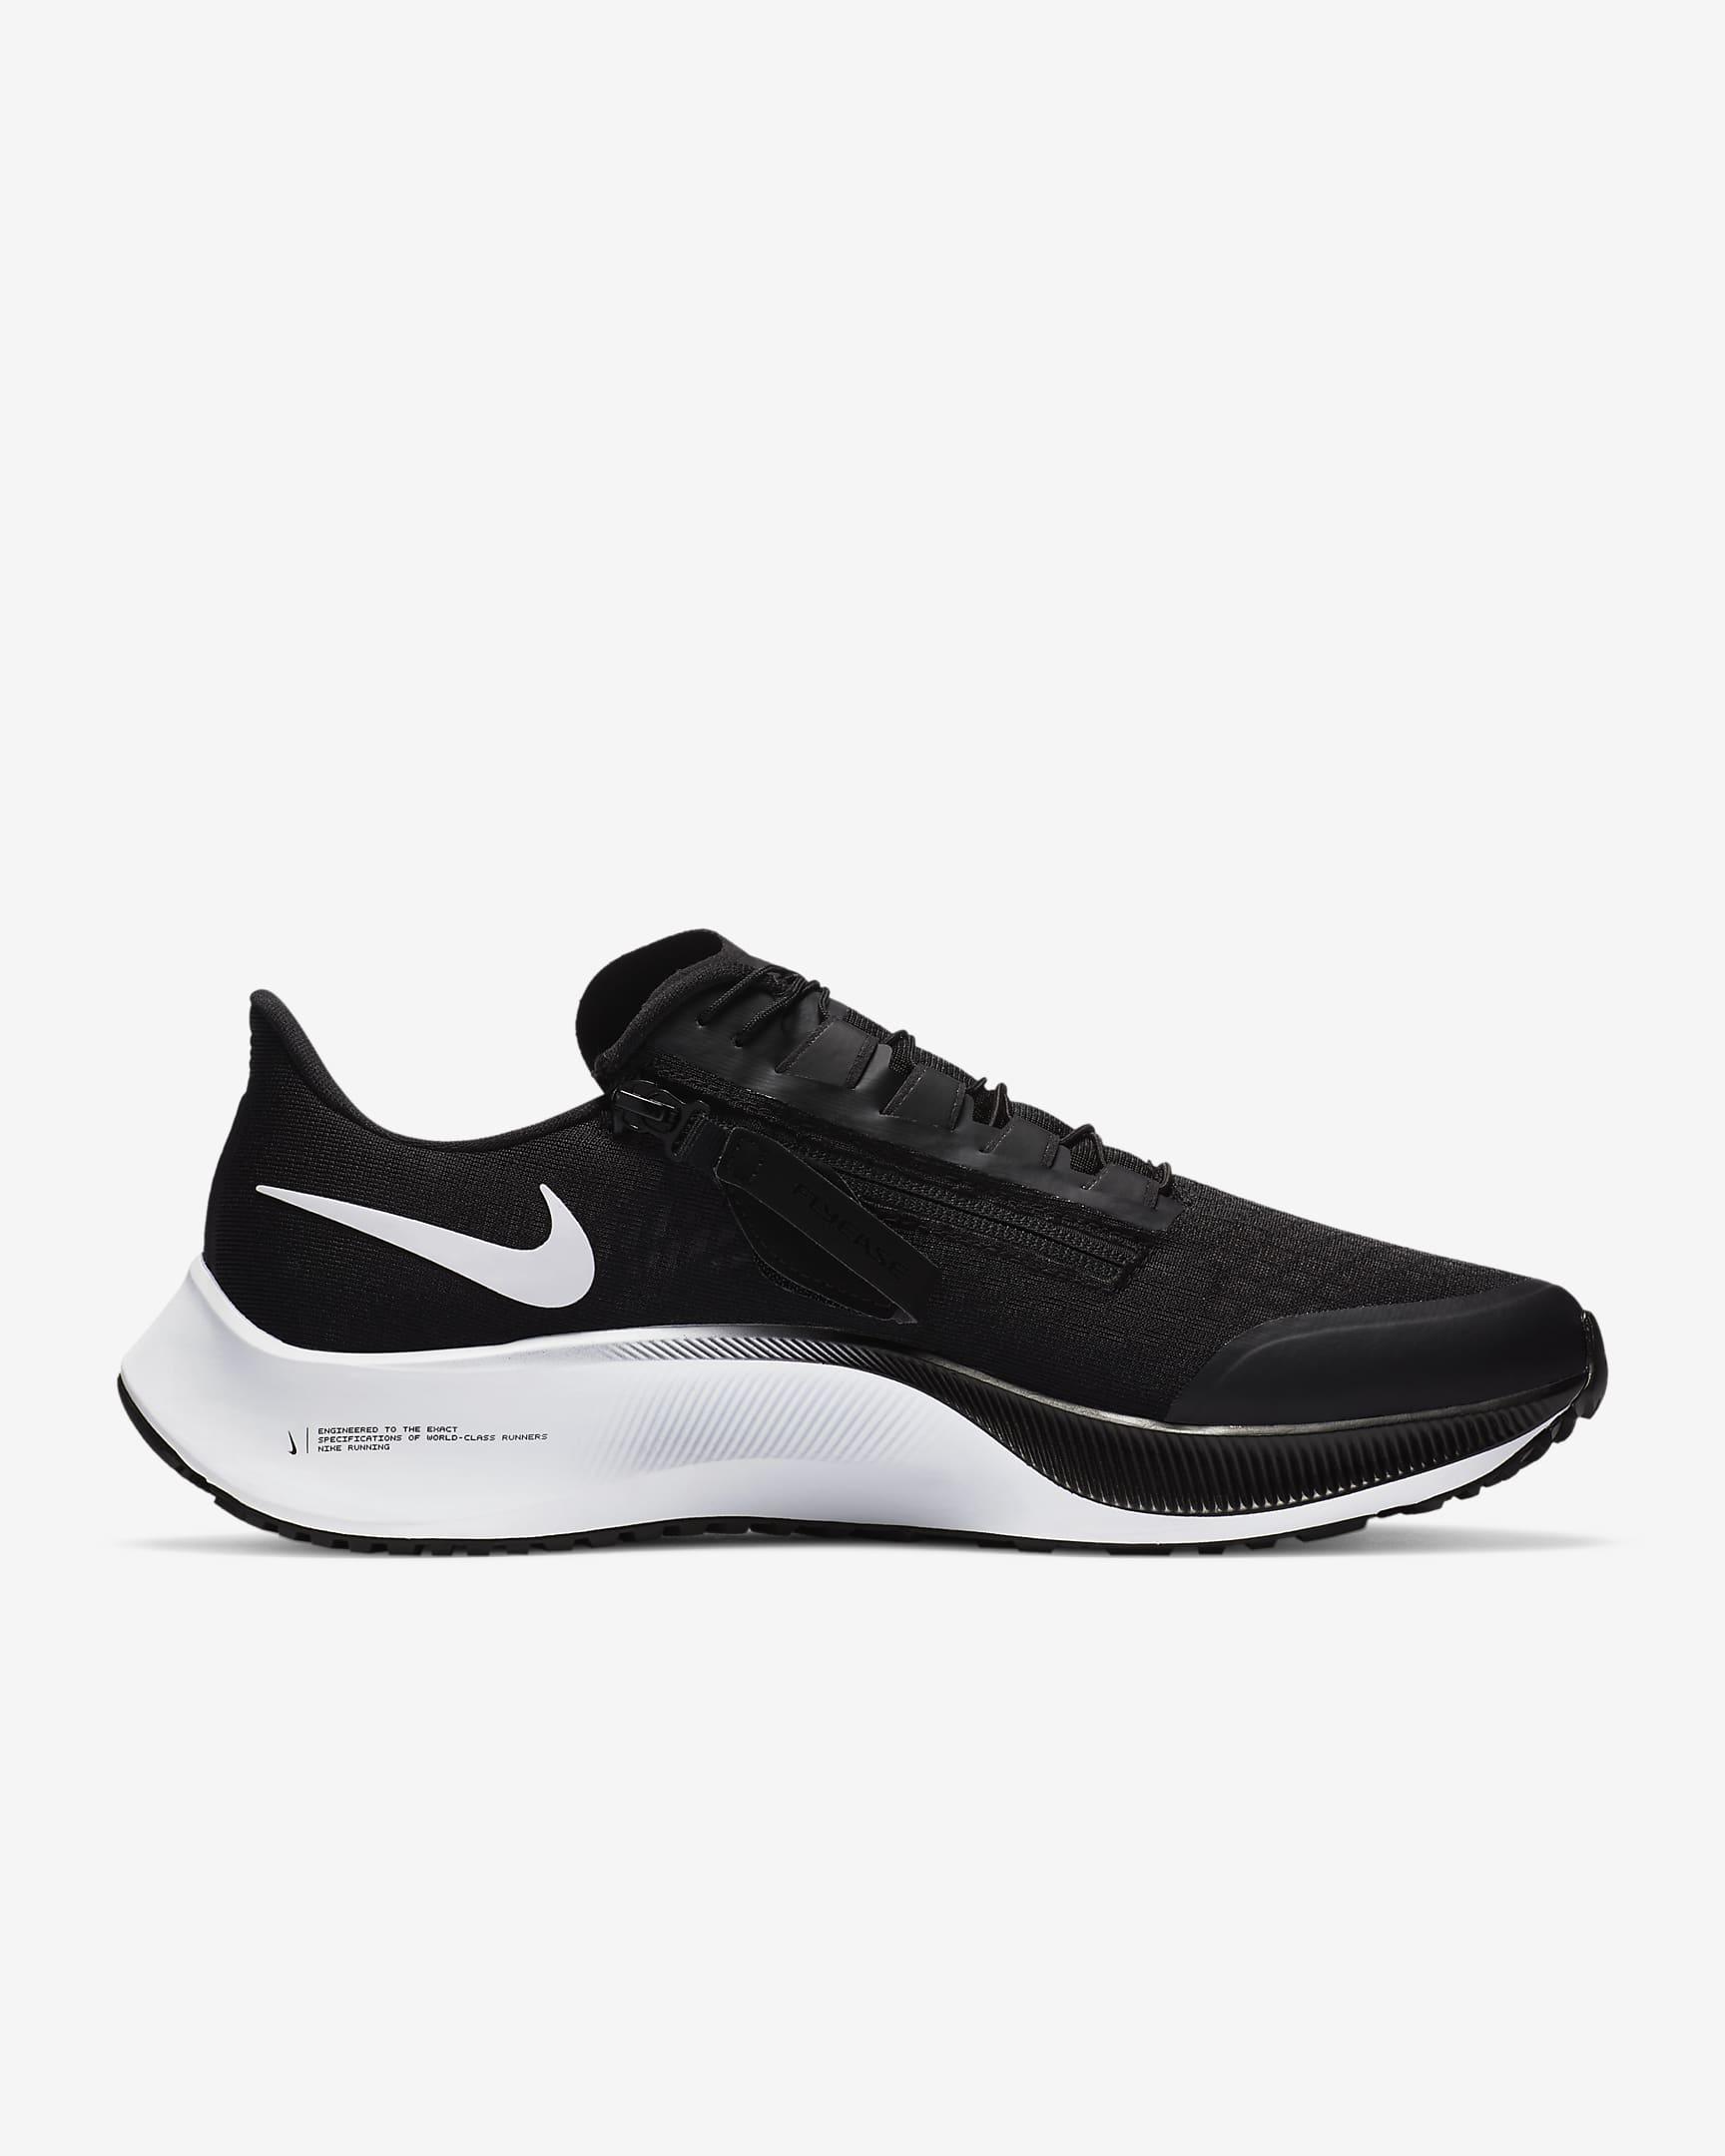 Nike | NIKE AIR ZOOM PEGASUS 37 FLYEASE MEN SHOE